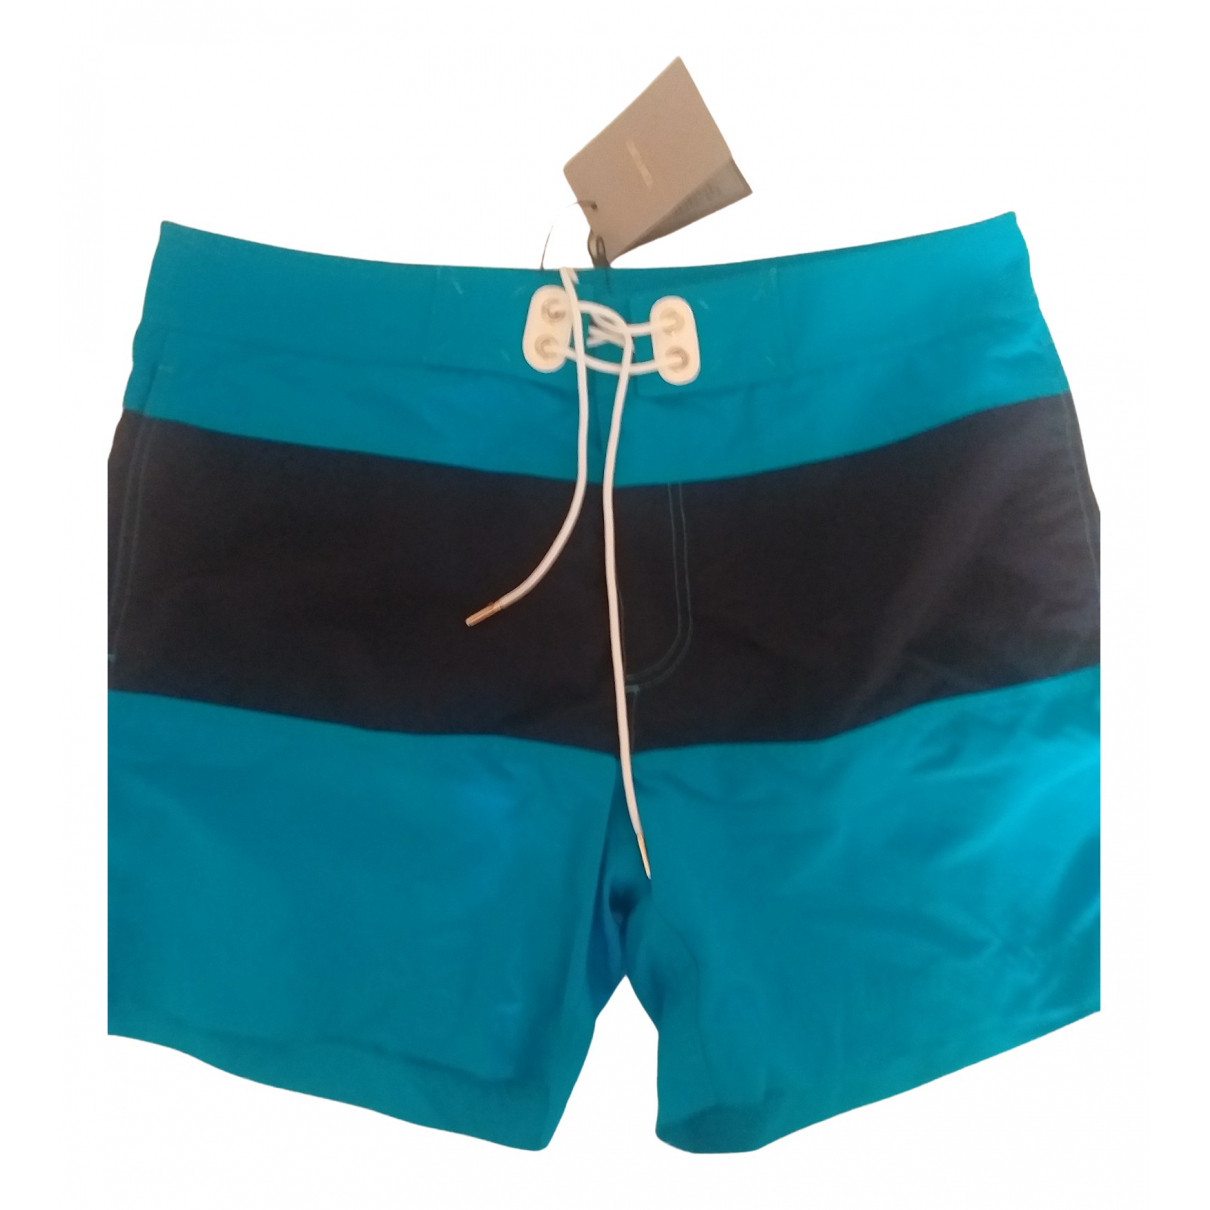 Tom Ford N Turquoise Cotton - elasthane Swimwear for Men XL International